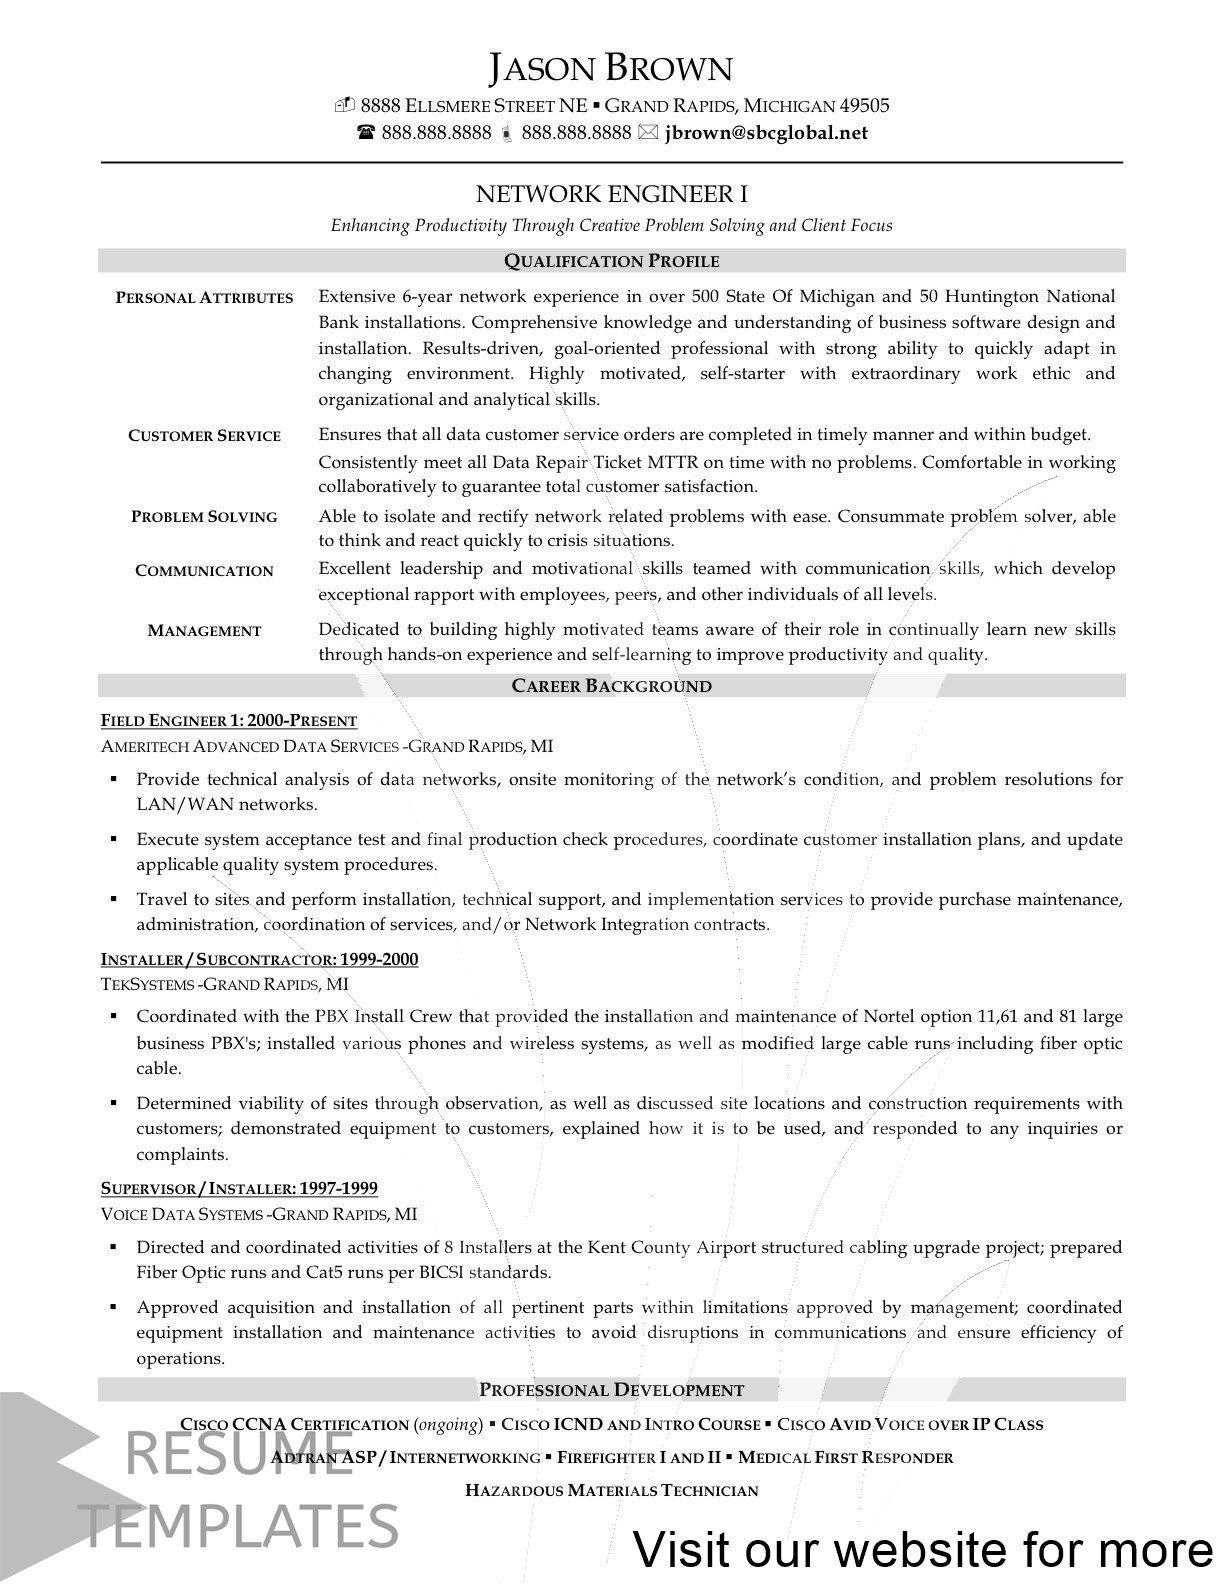 33 Resume Design Minimalist Creative Cv Network Engineer Sample Resume Resume